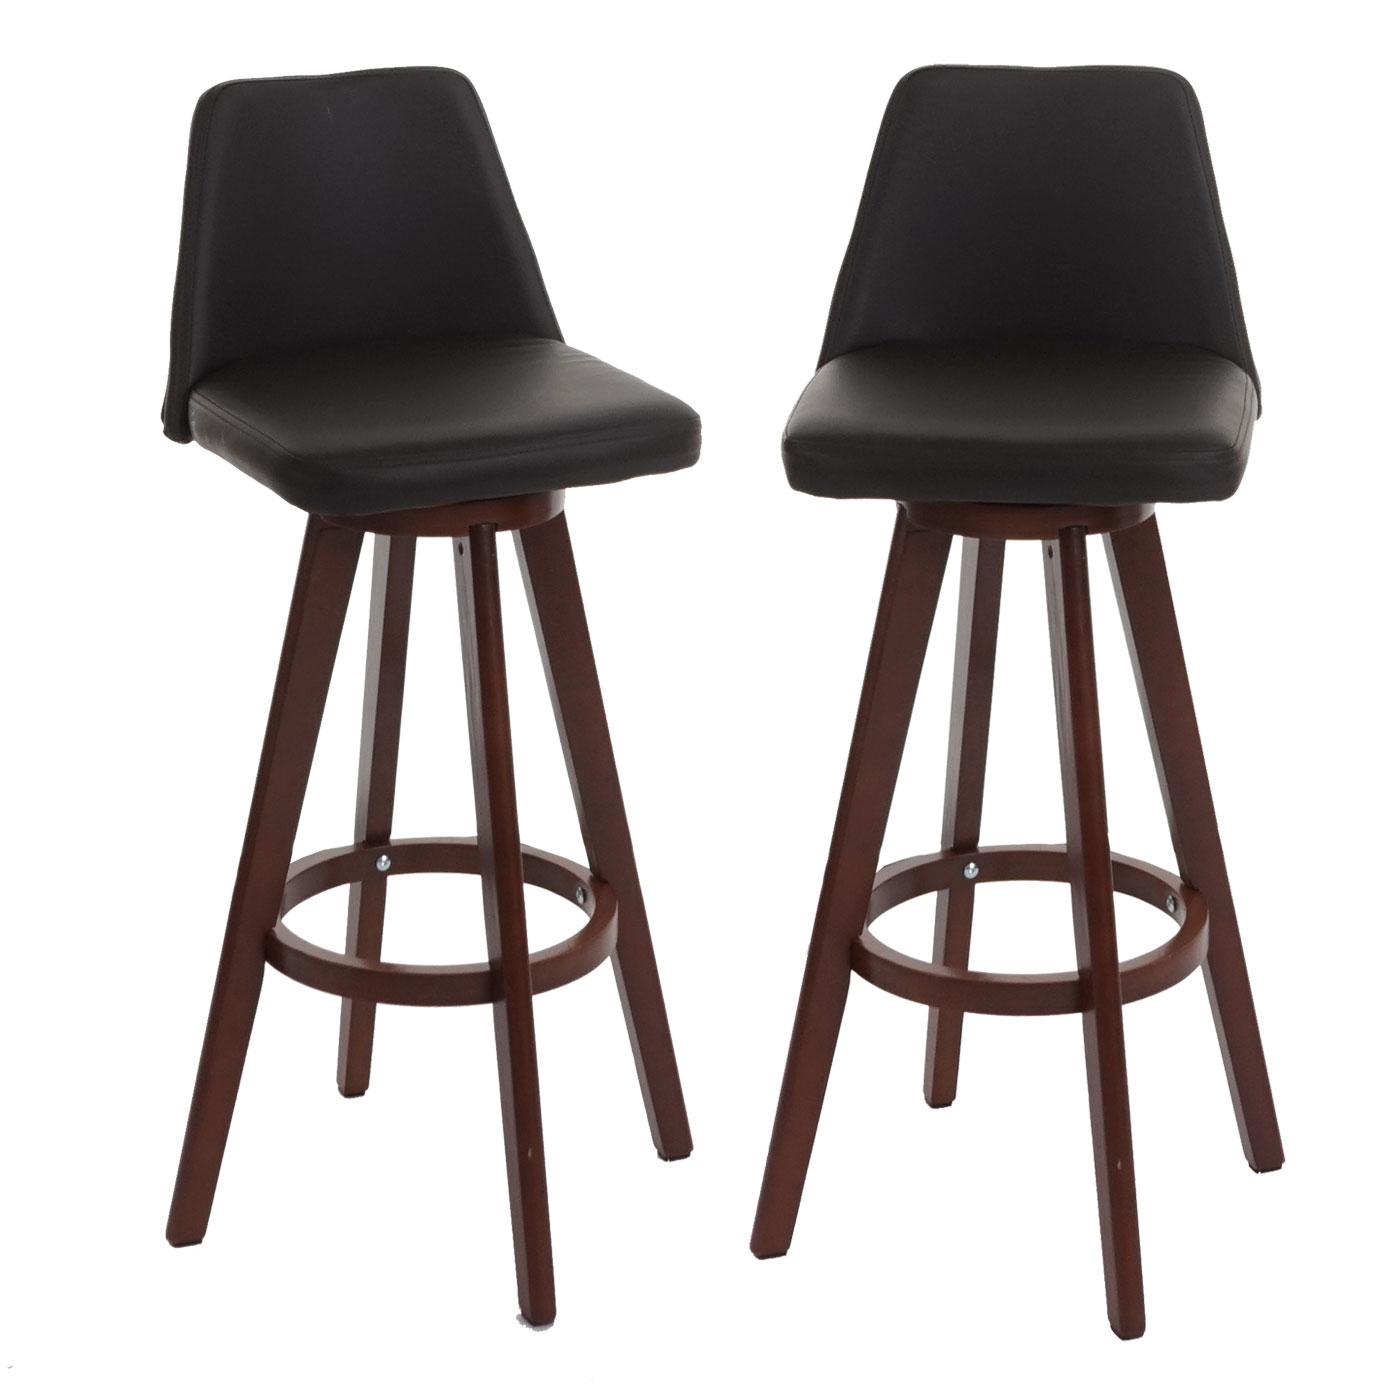 2x barhocker boras barstuhl tresenhocker holz kunstleder drehbar braun dunkle beine. Black Bedroom Furniture Sets. Home Design Ideas